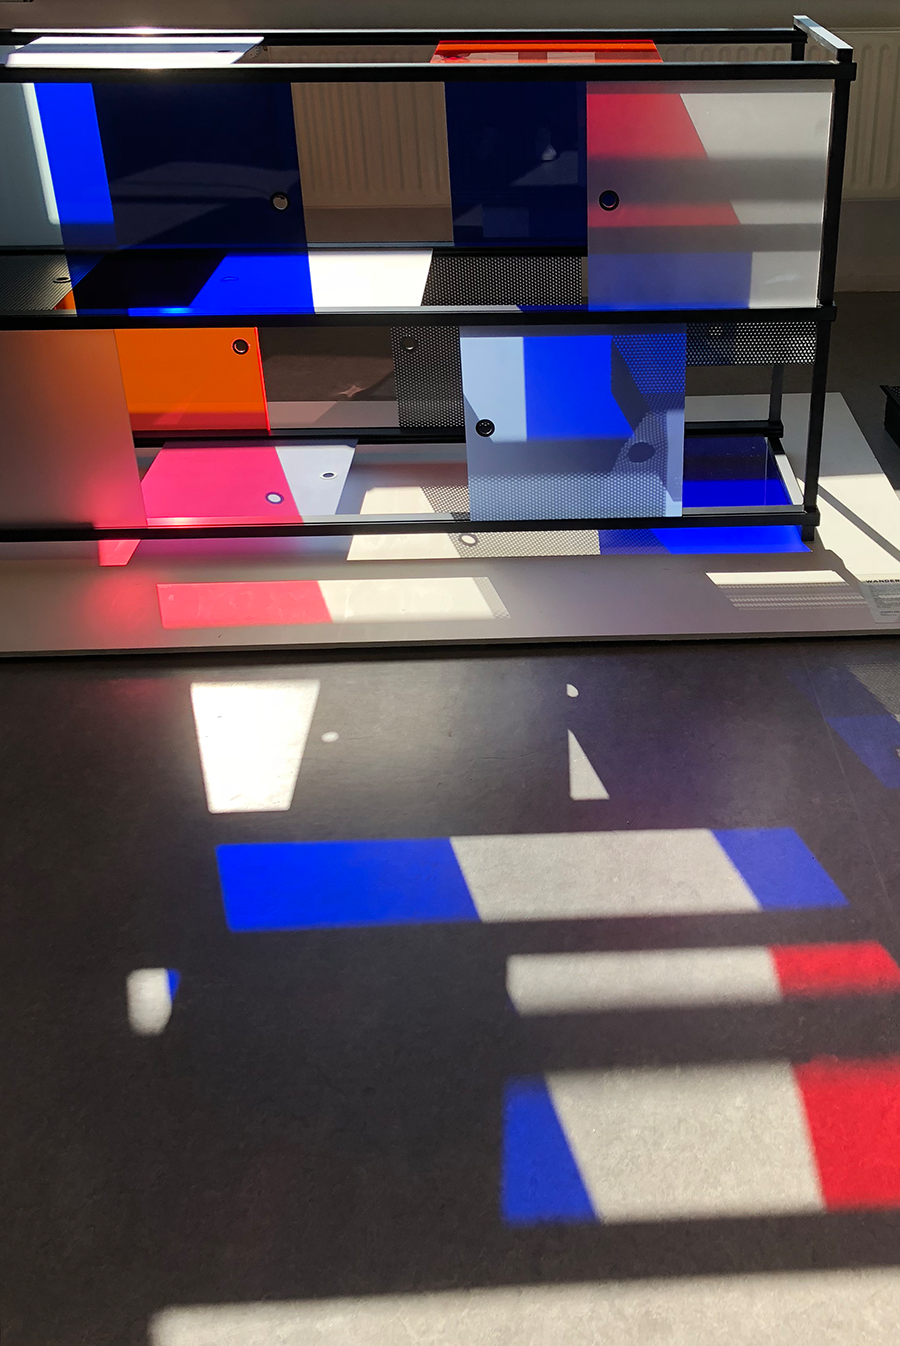 wanderlust_cabinet_explorer_black_modular_design_leandra-eibl_dutch_design_week_design_academy_graduation_show_campina_2018_9.png